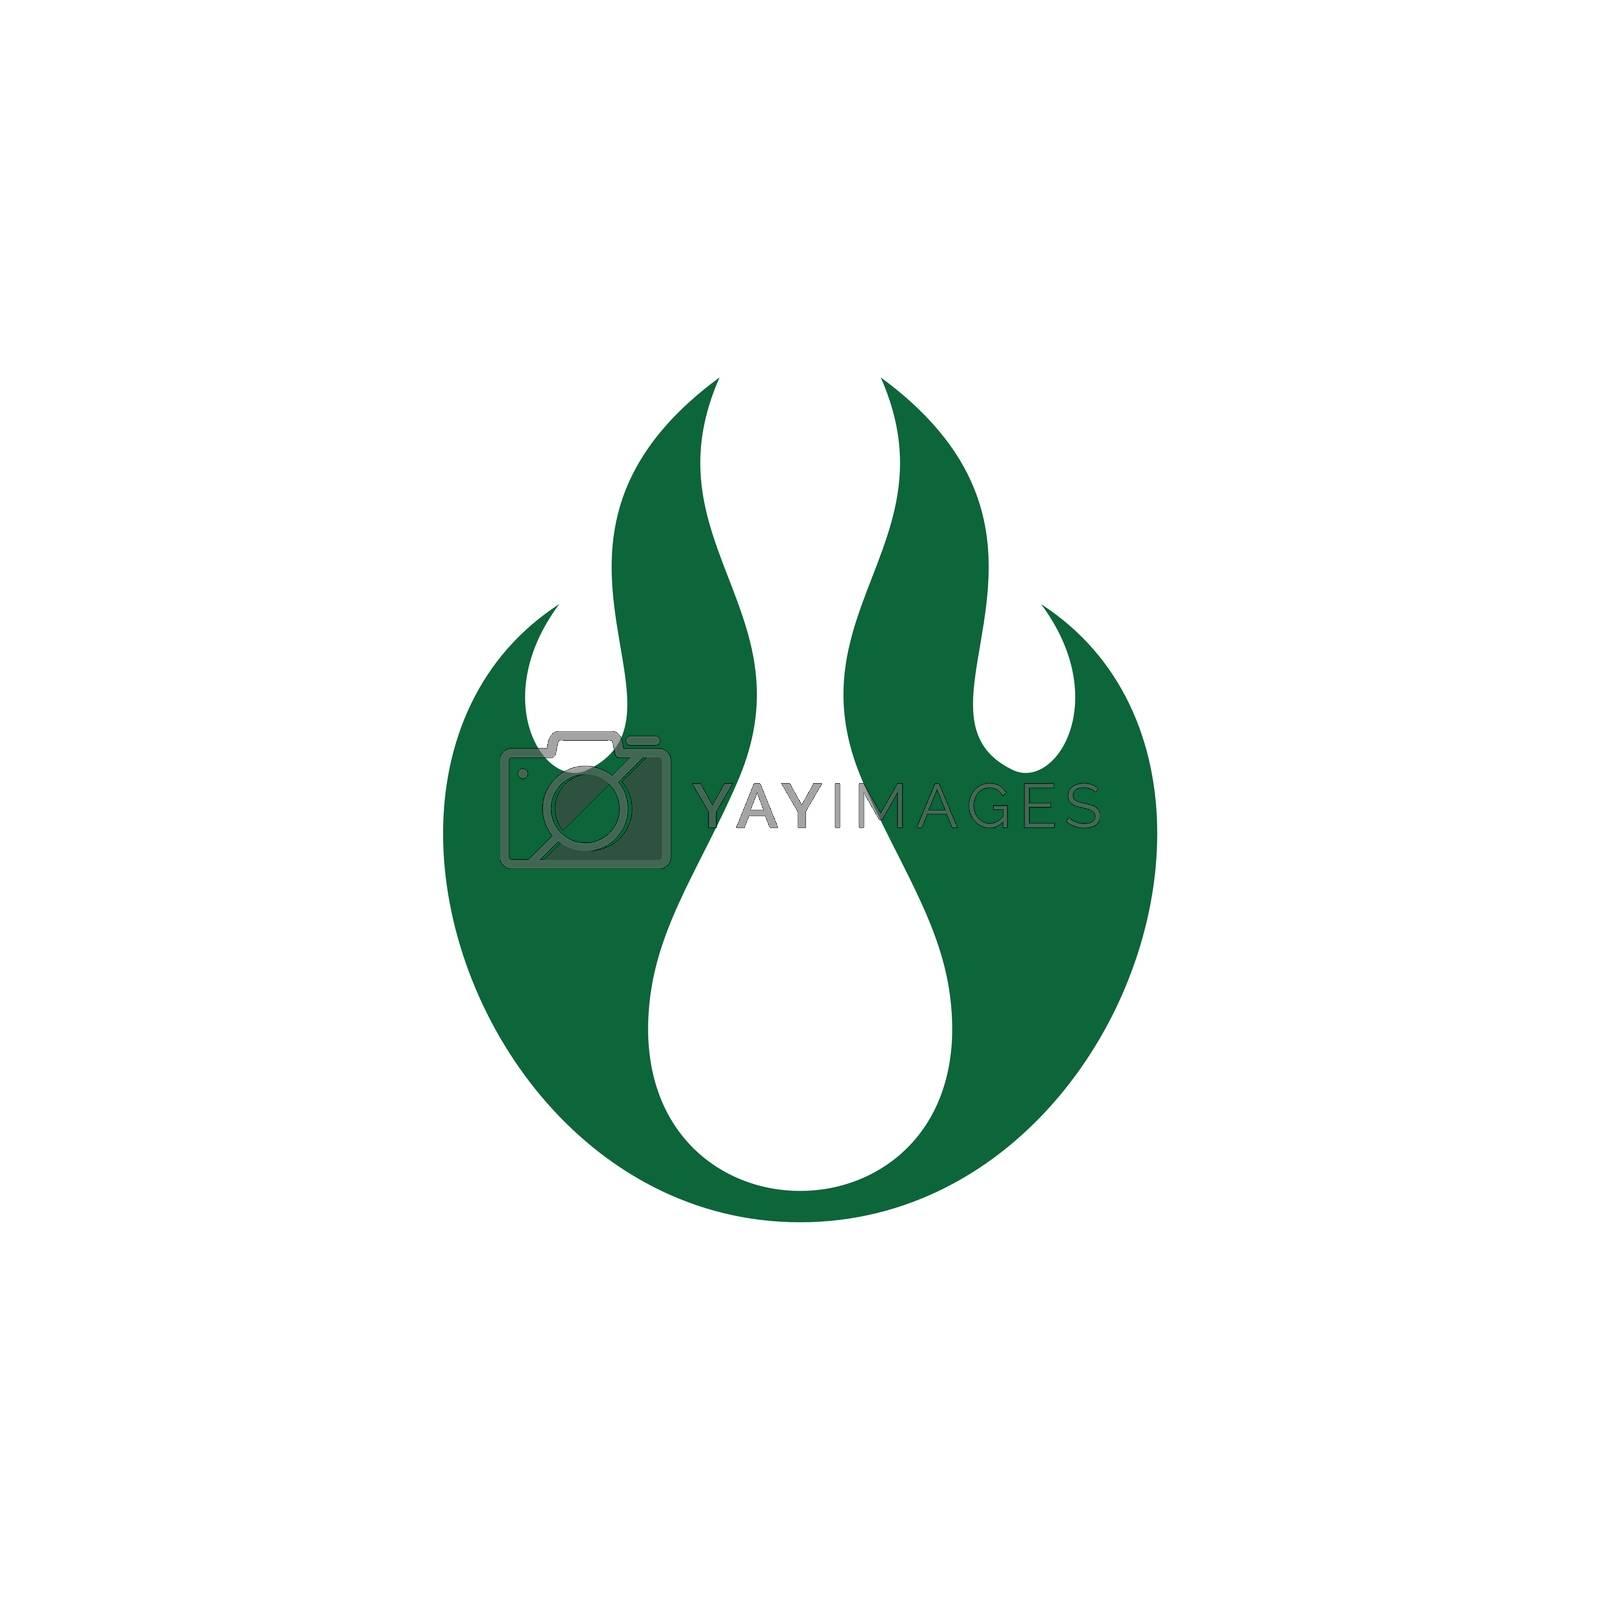 Green Flame Spirit Logo Template Illustration Design. Vector EPS 10.